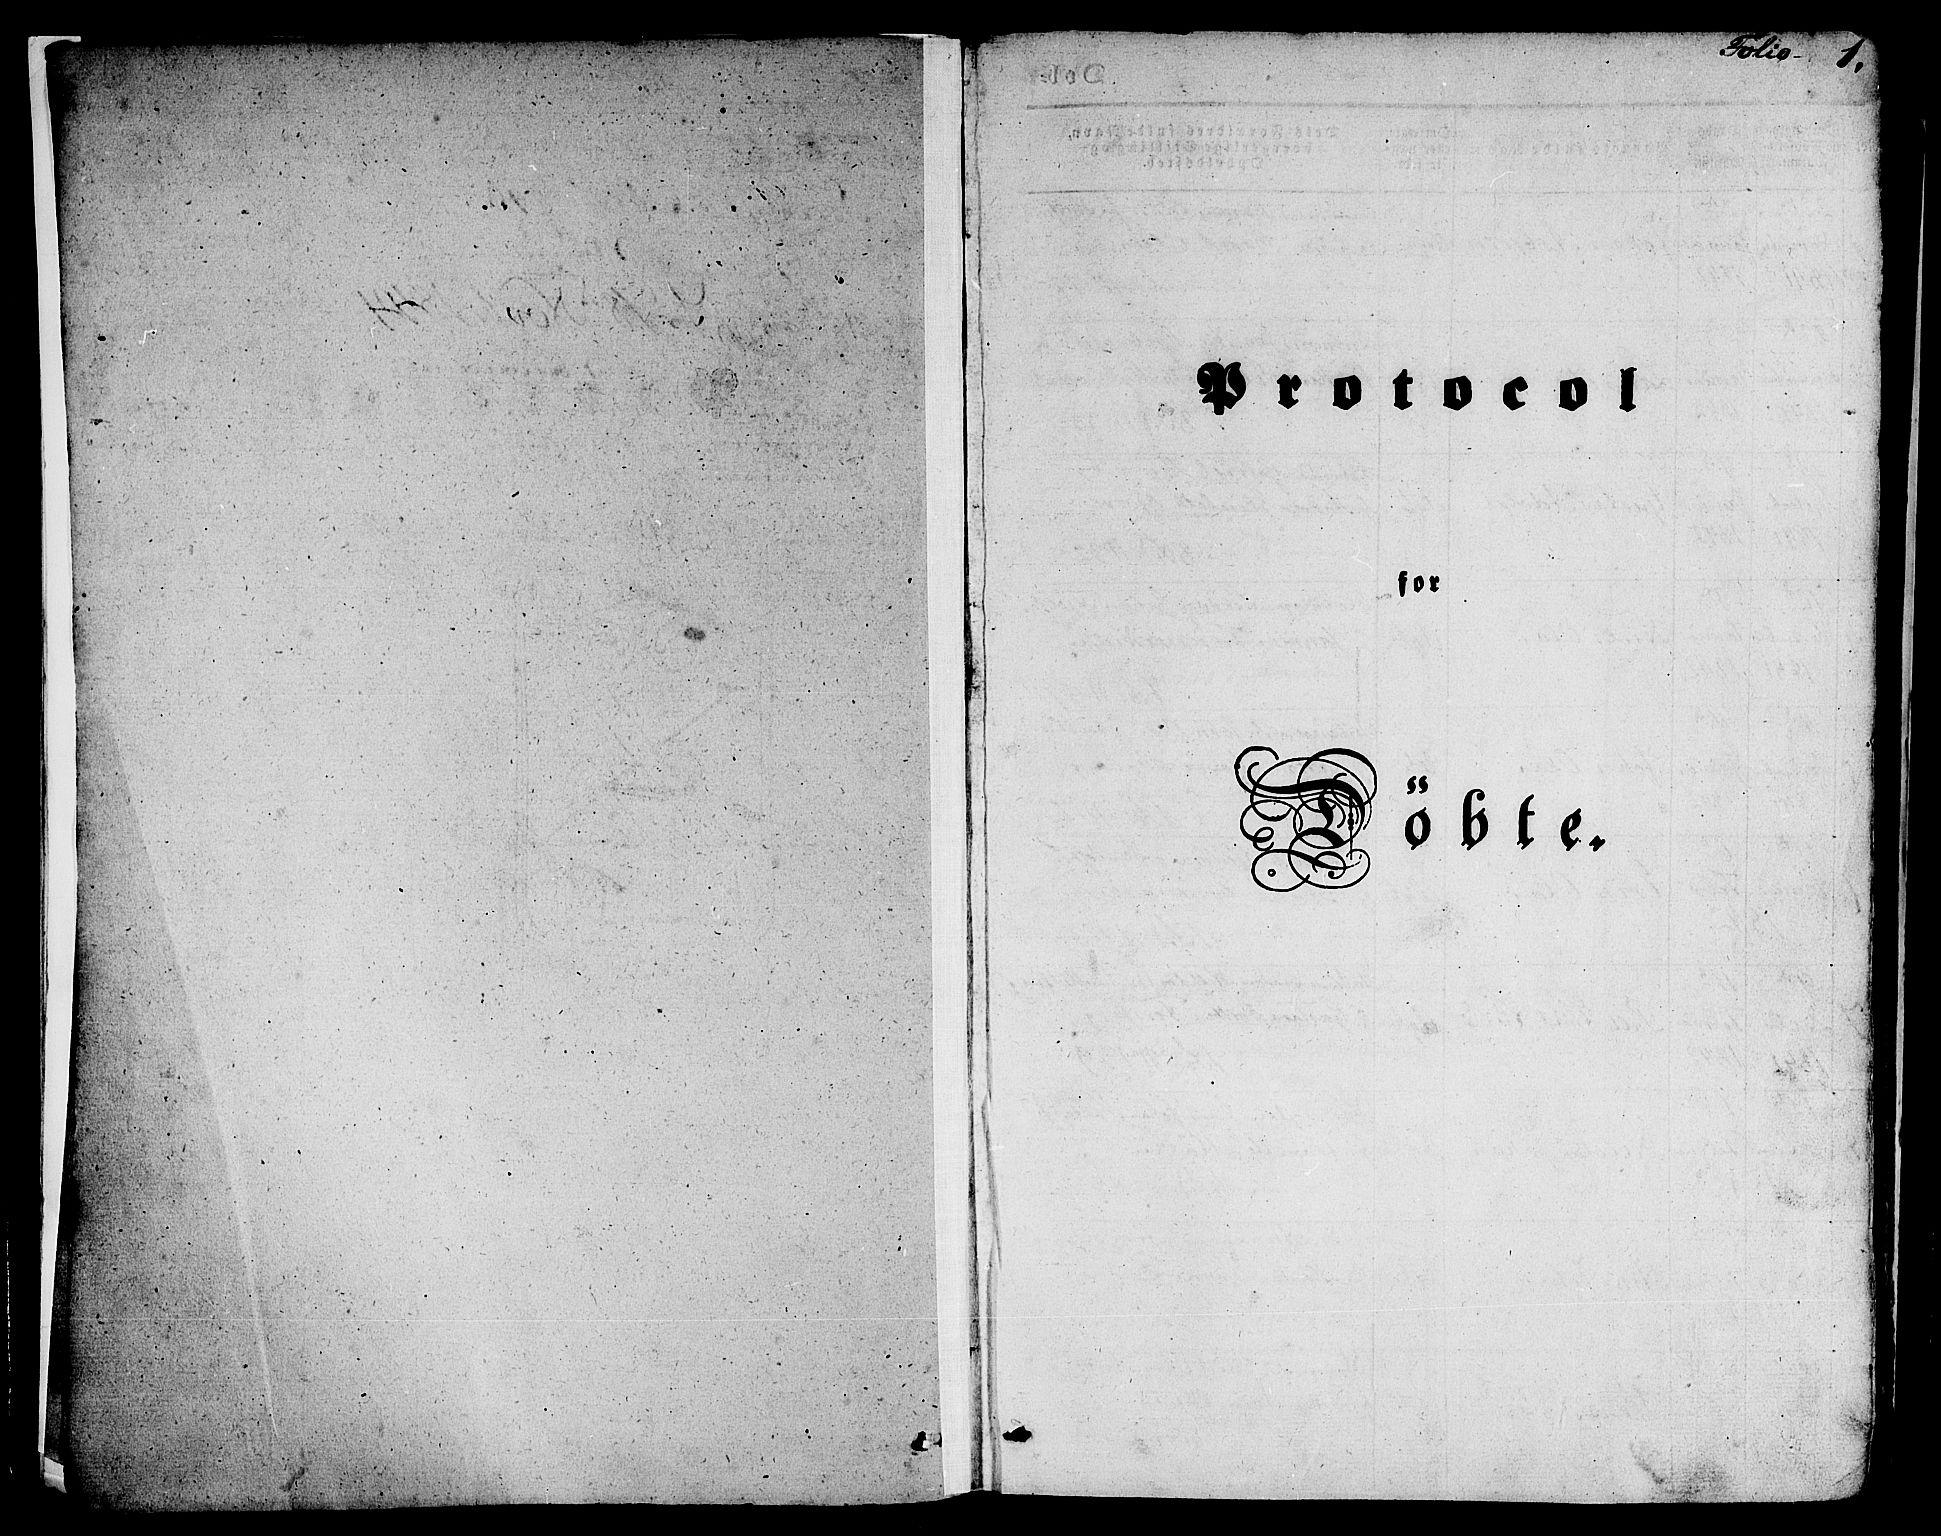 SAB, Nykirken Sokneprestembete, H/Hab: Klokkerbok nr. B 1, 1842-1858, s. 1